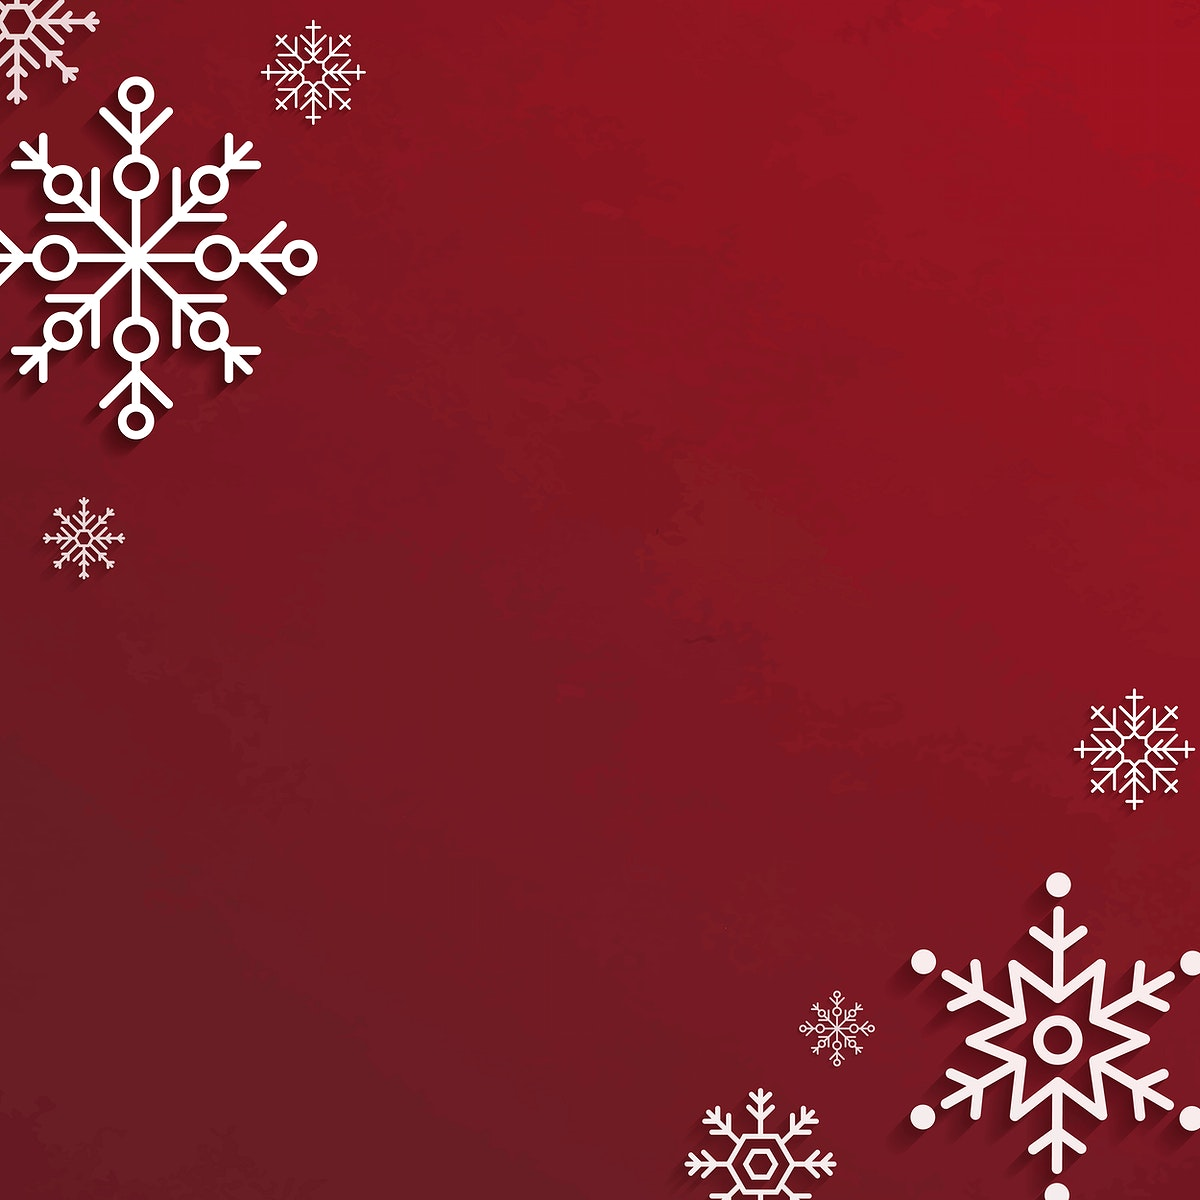 Christmas snowflake frame social ads template vector